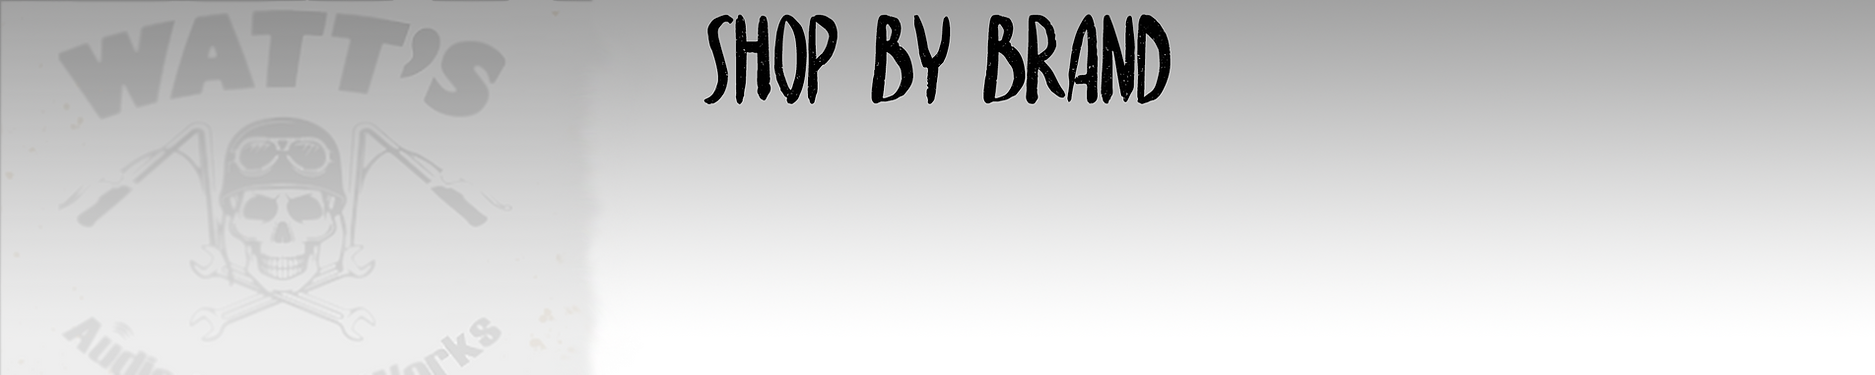 ShopbyBrandMenu.png